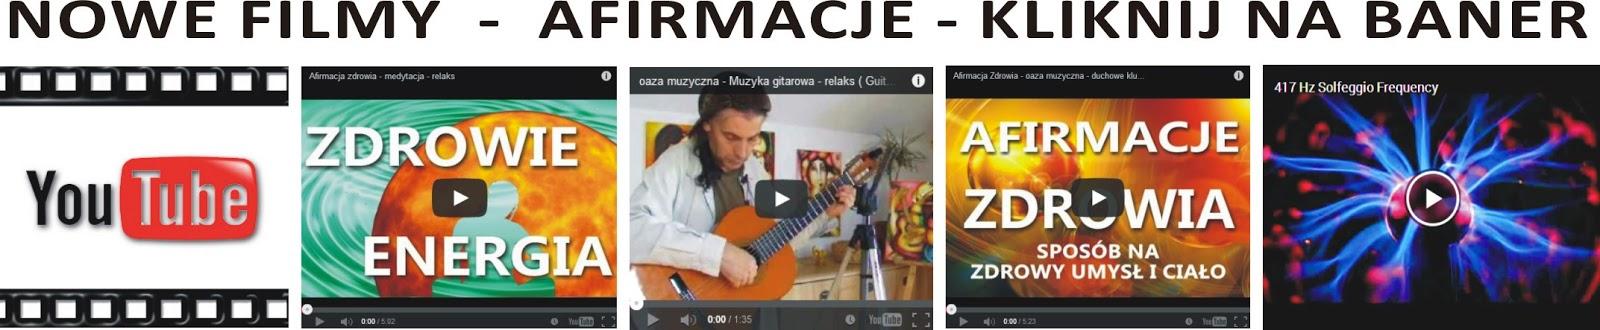 YouTube - serafjogin - oaza muzyczna